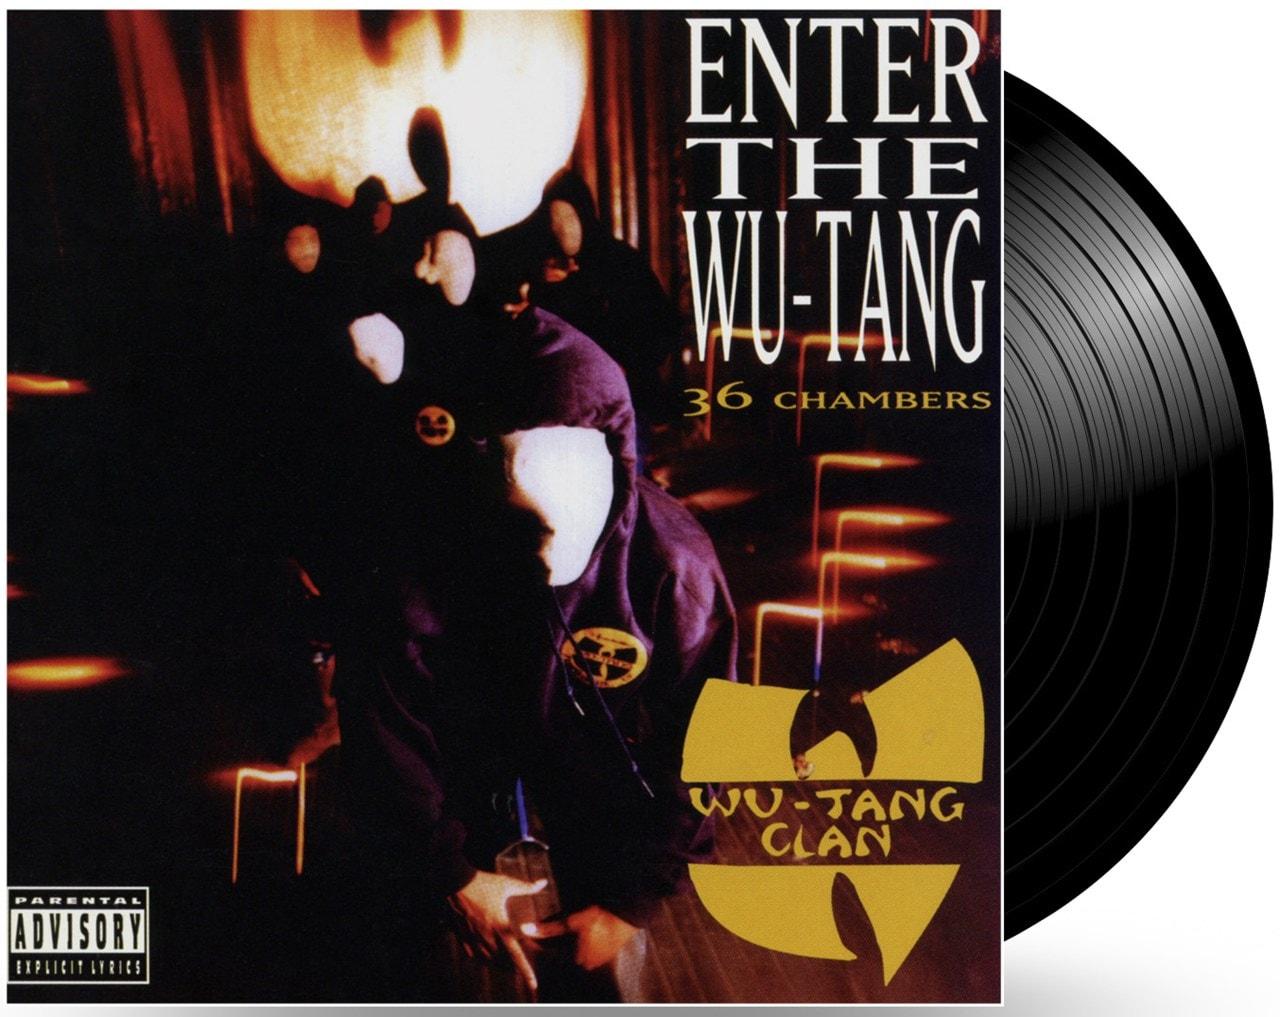 Enter the Wu-Tang (36 Chambers) - 2